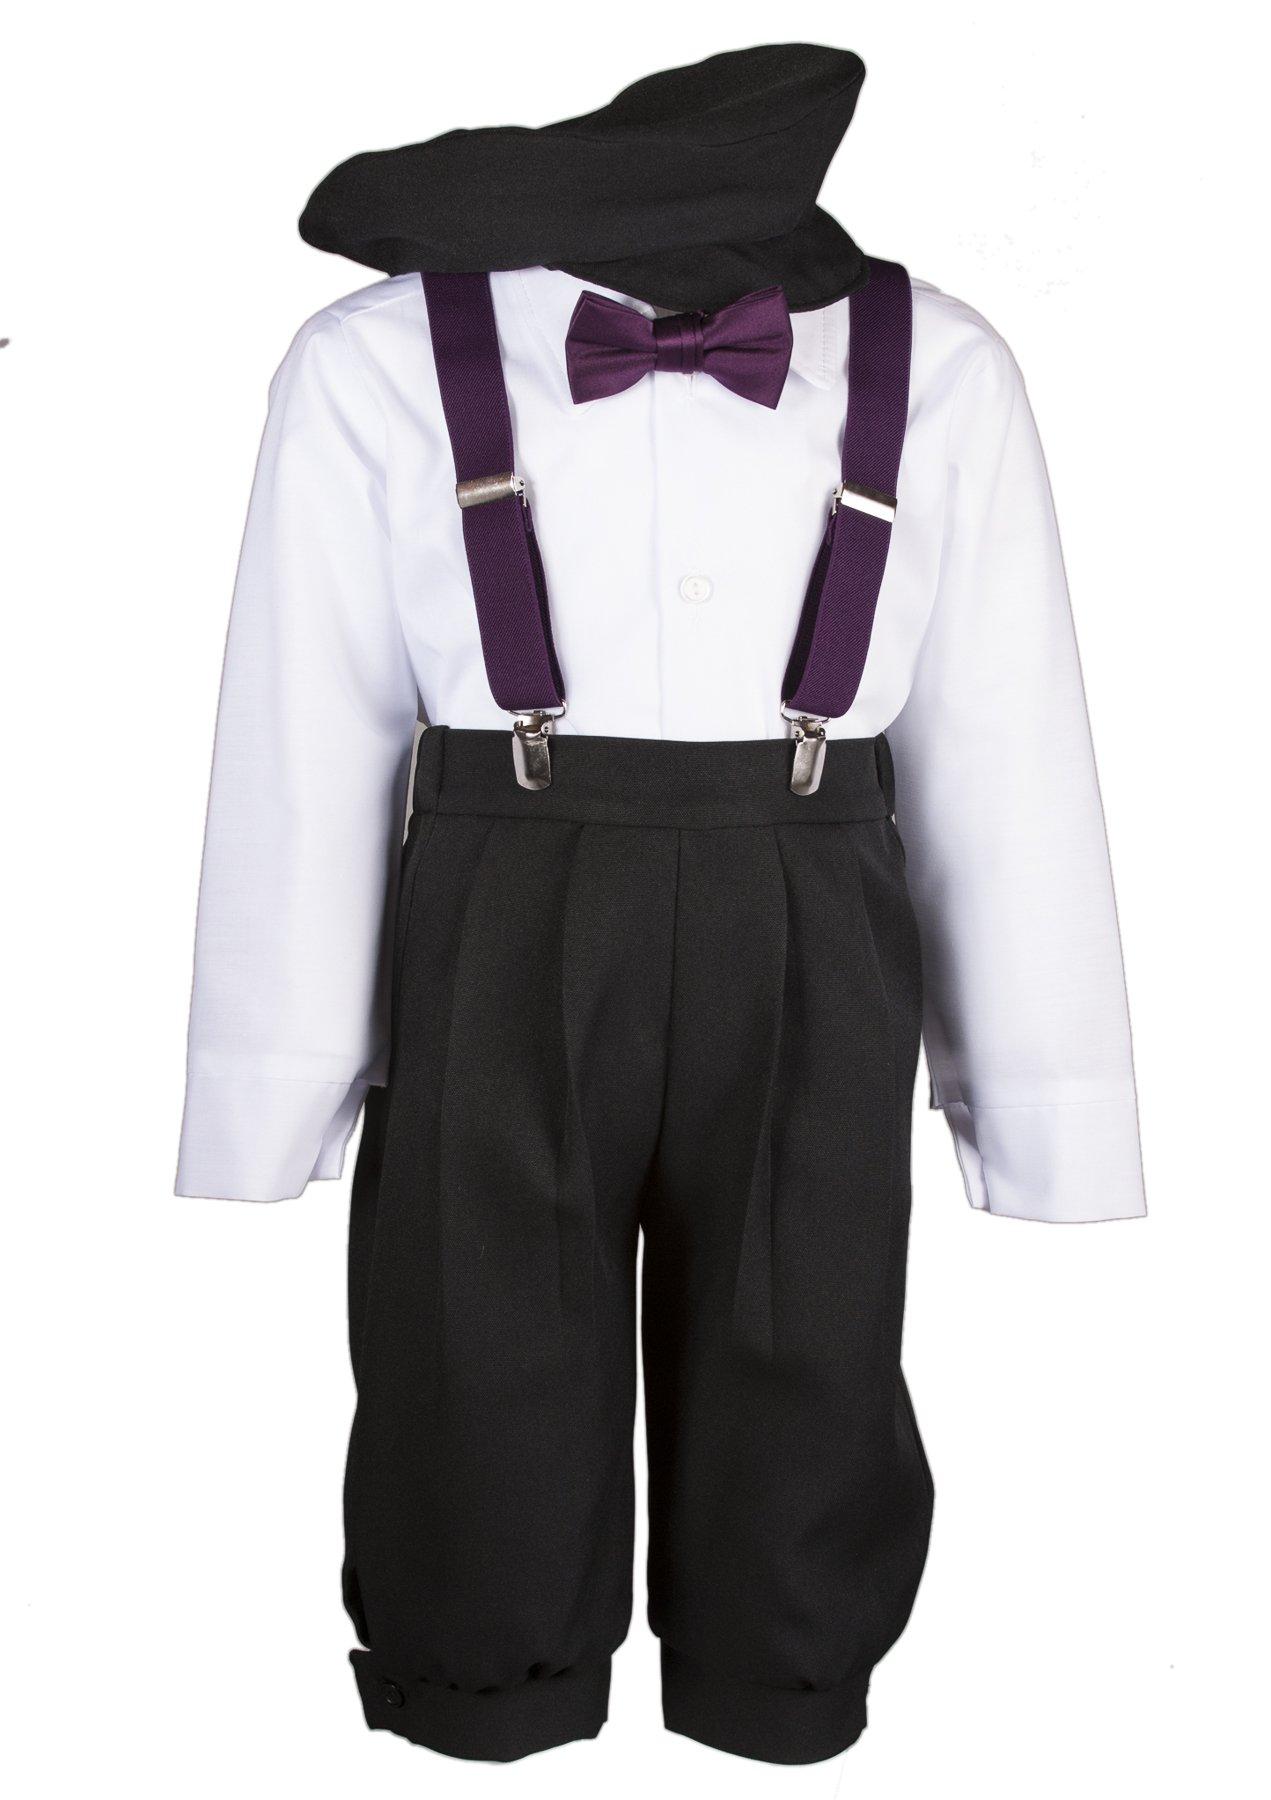 Tuxgear Boys Black Knickers Set Pageboy Cap Berry Suspenders & Bow Tie (7 Boys)